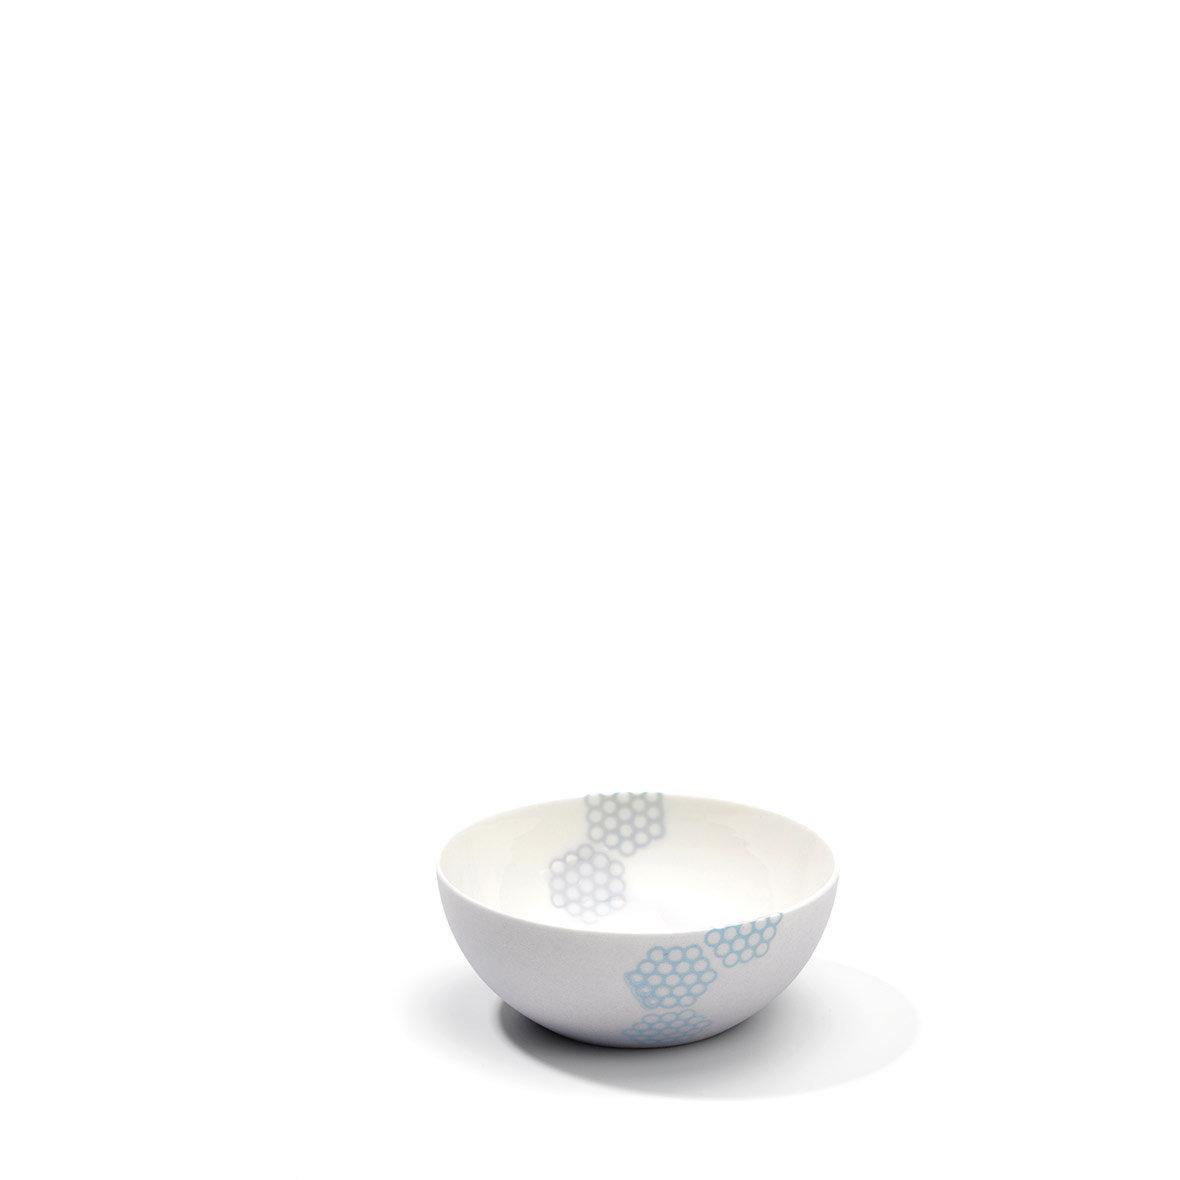 Kleine Teeschale aus Porzellan